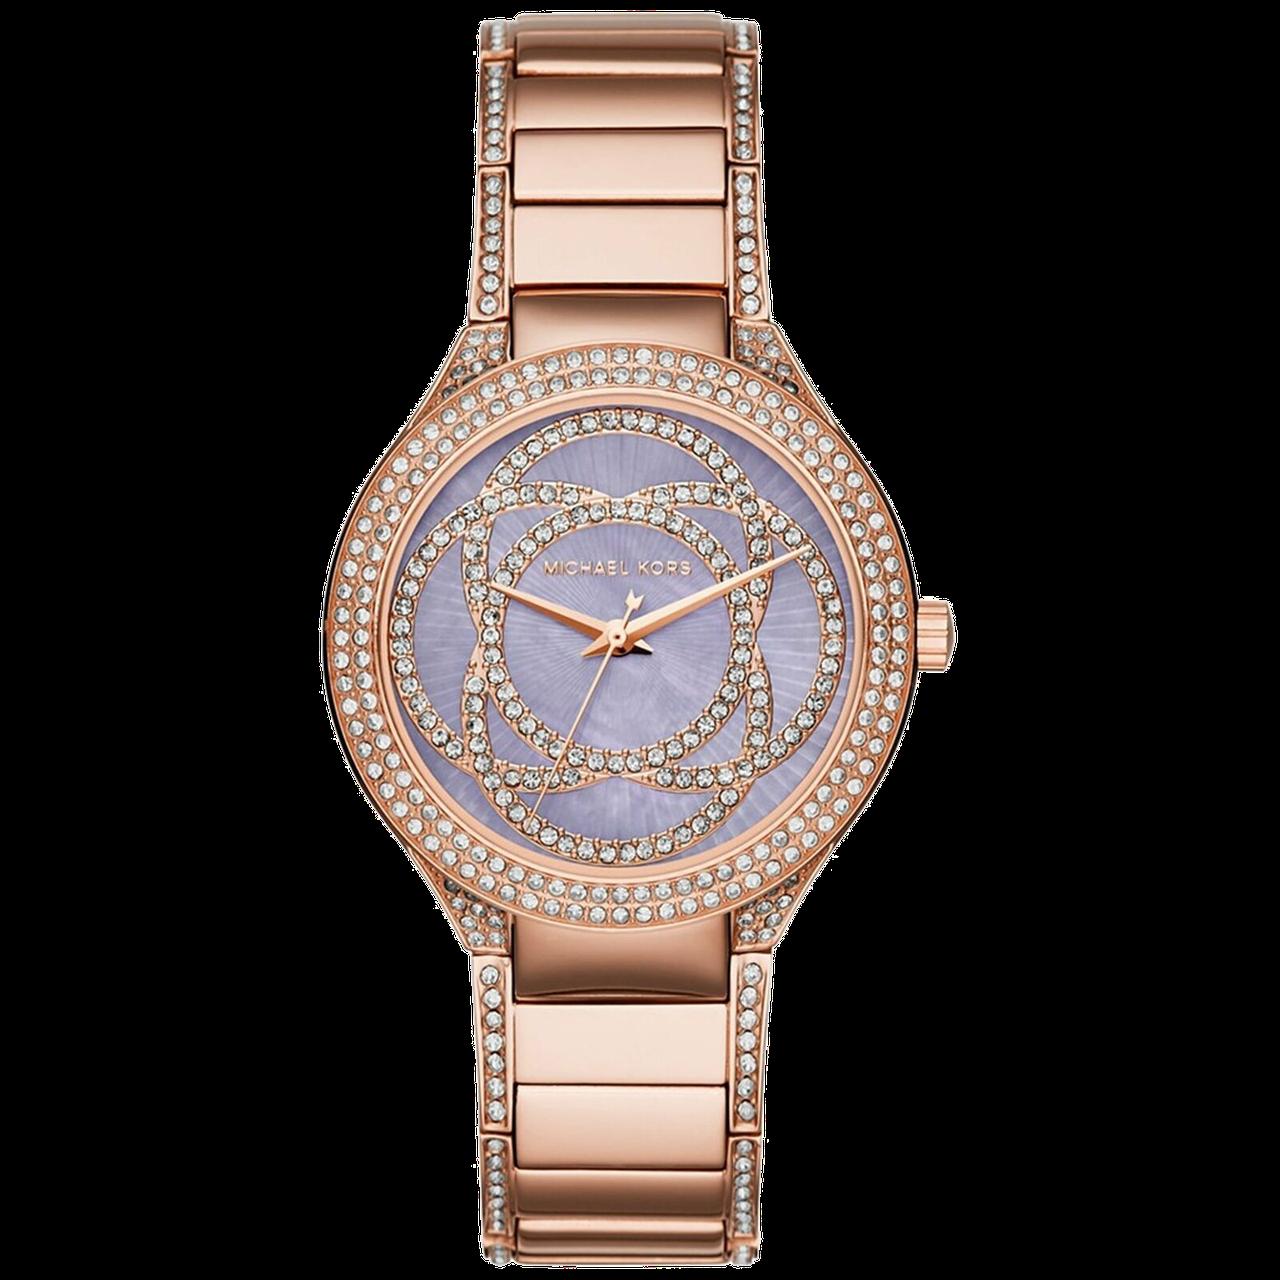 Женские часы Michael Kors MK3482